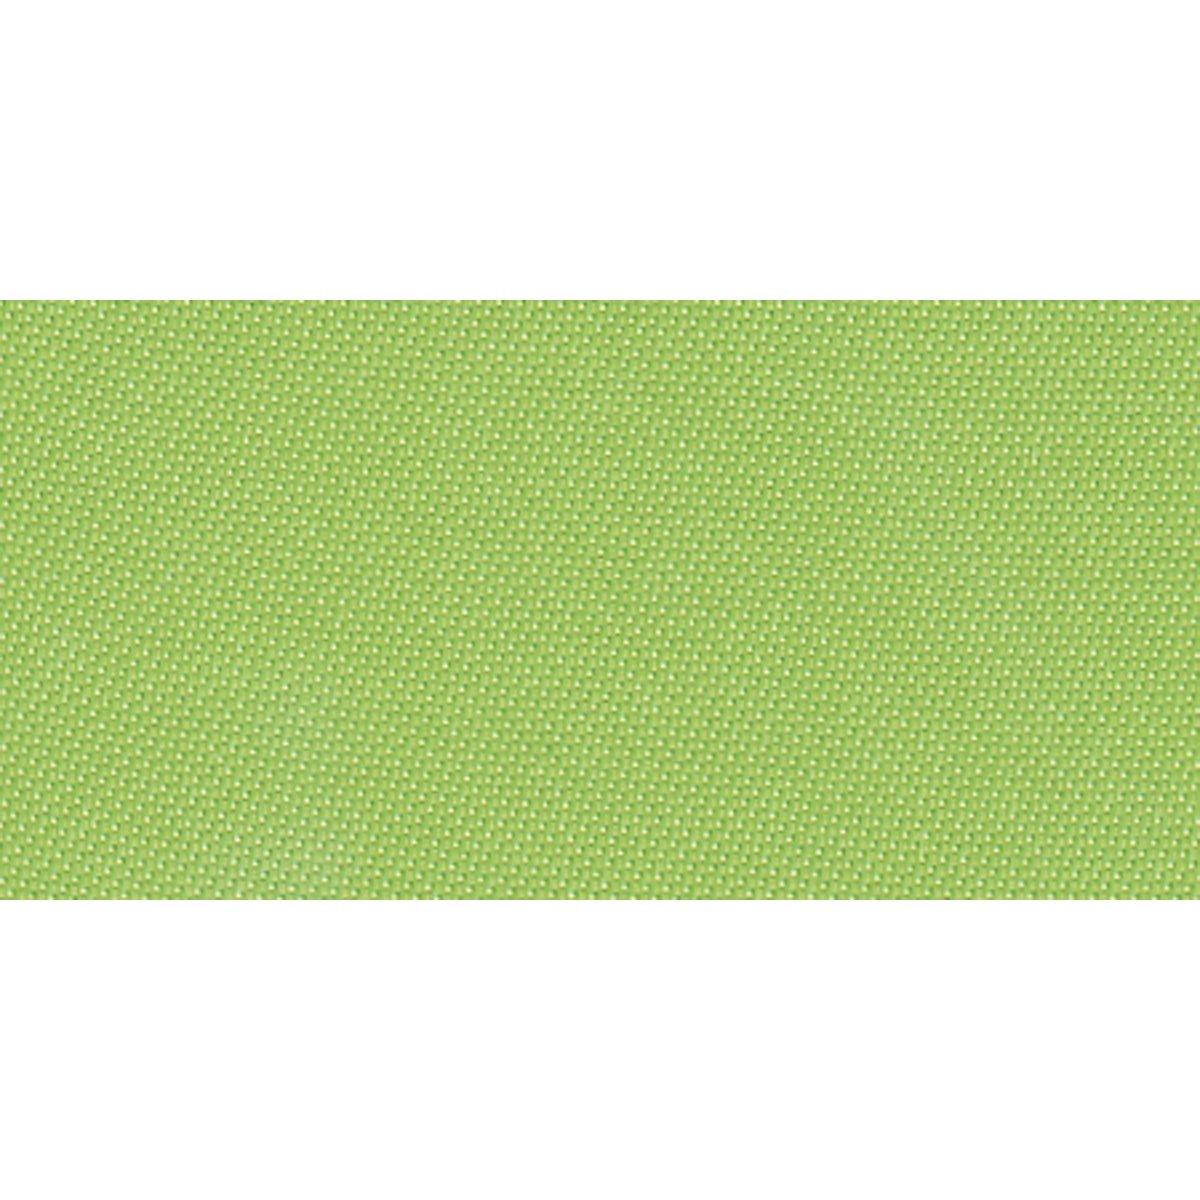 Wrights 117-794-922 Single Fold Satin Blanket Binding 4.75-Yard Leaf Green